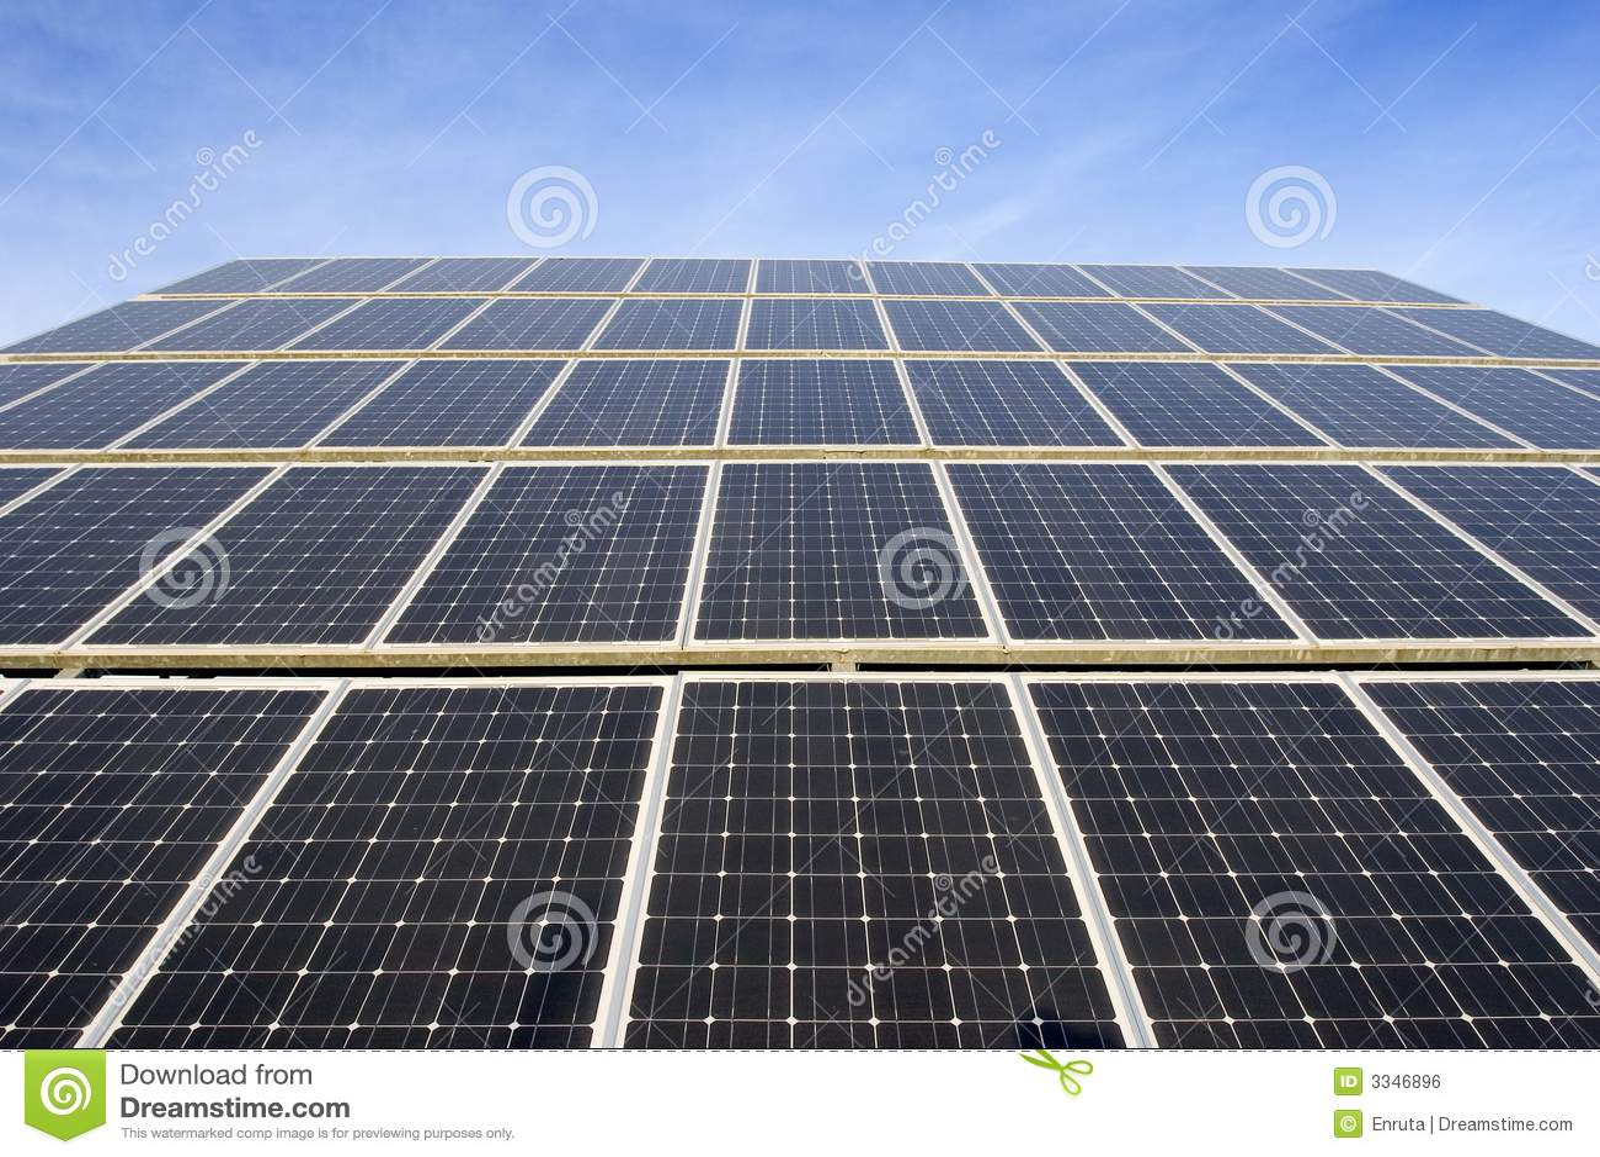 solar panel background - photo #48